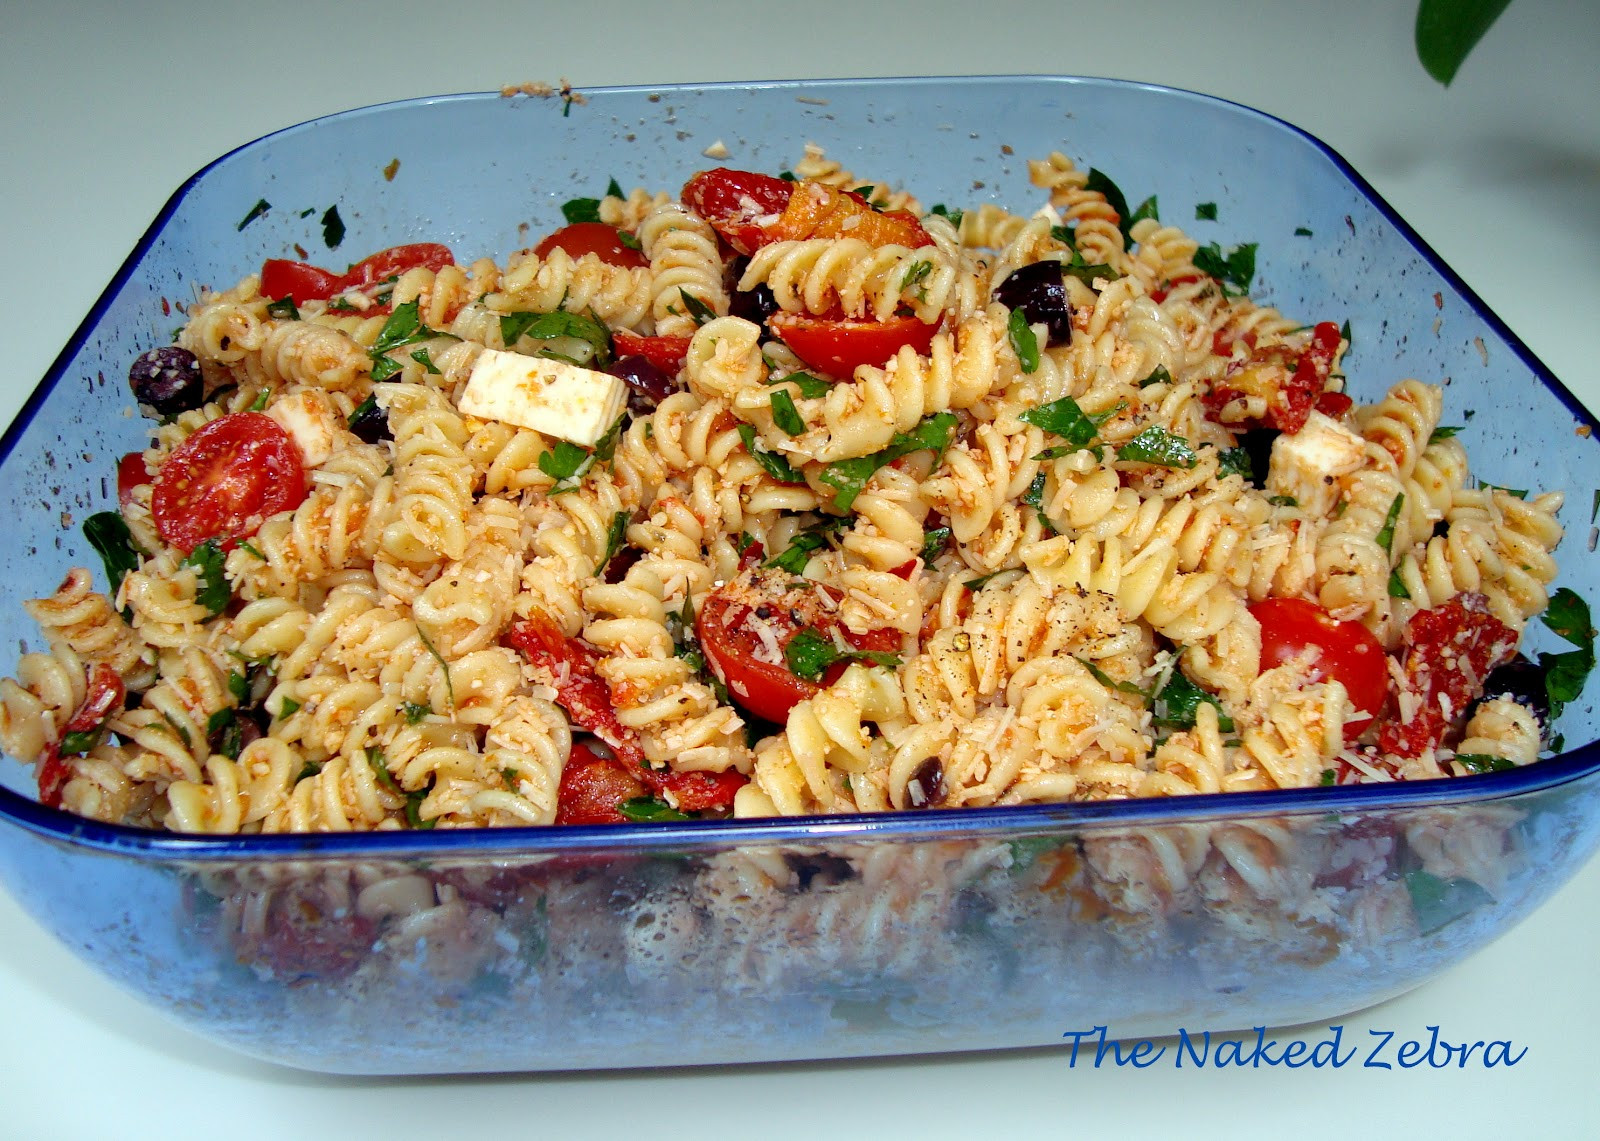 Ina Garten Pasta Salad  The Naked Zebra Tomato Feta Pasta Salad Ina Garten